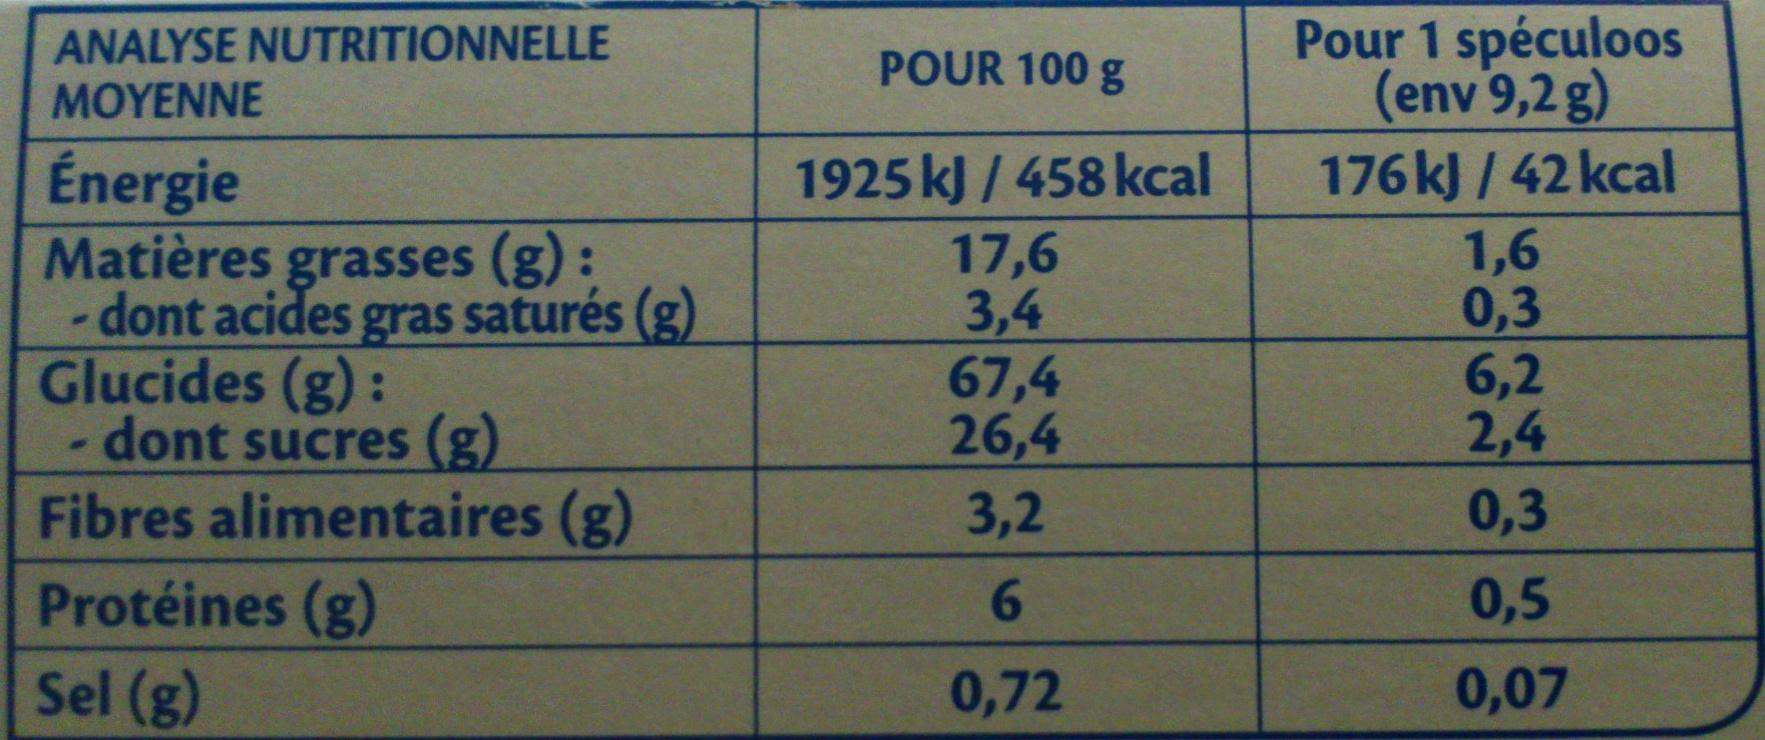 Spéculoos Bio - Voedingswaarden